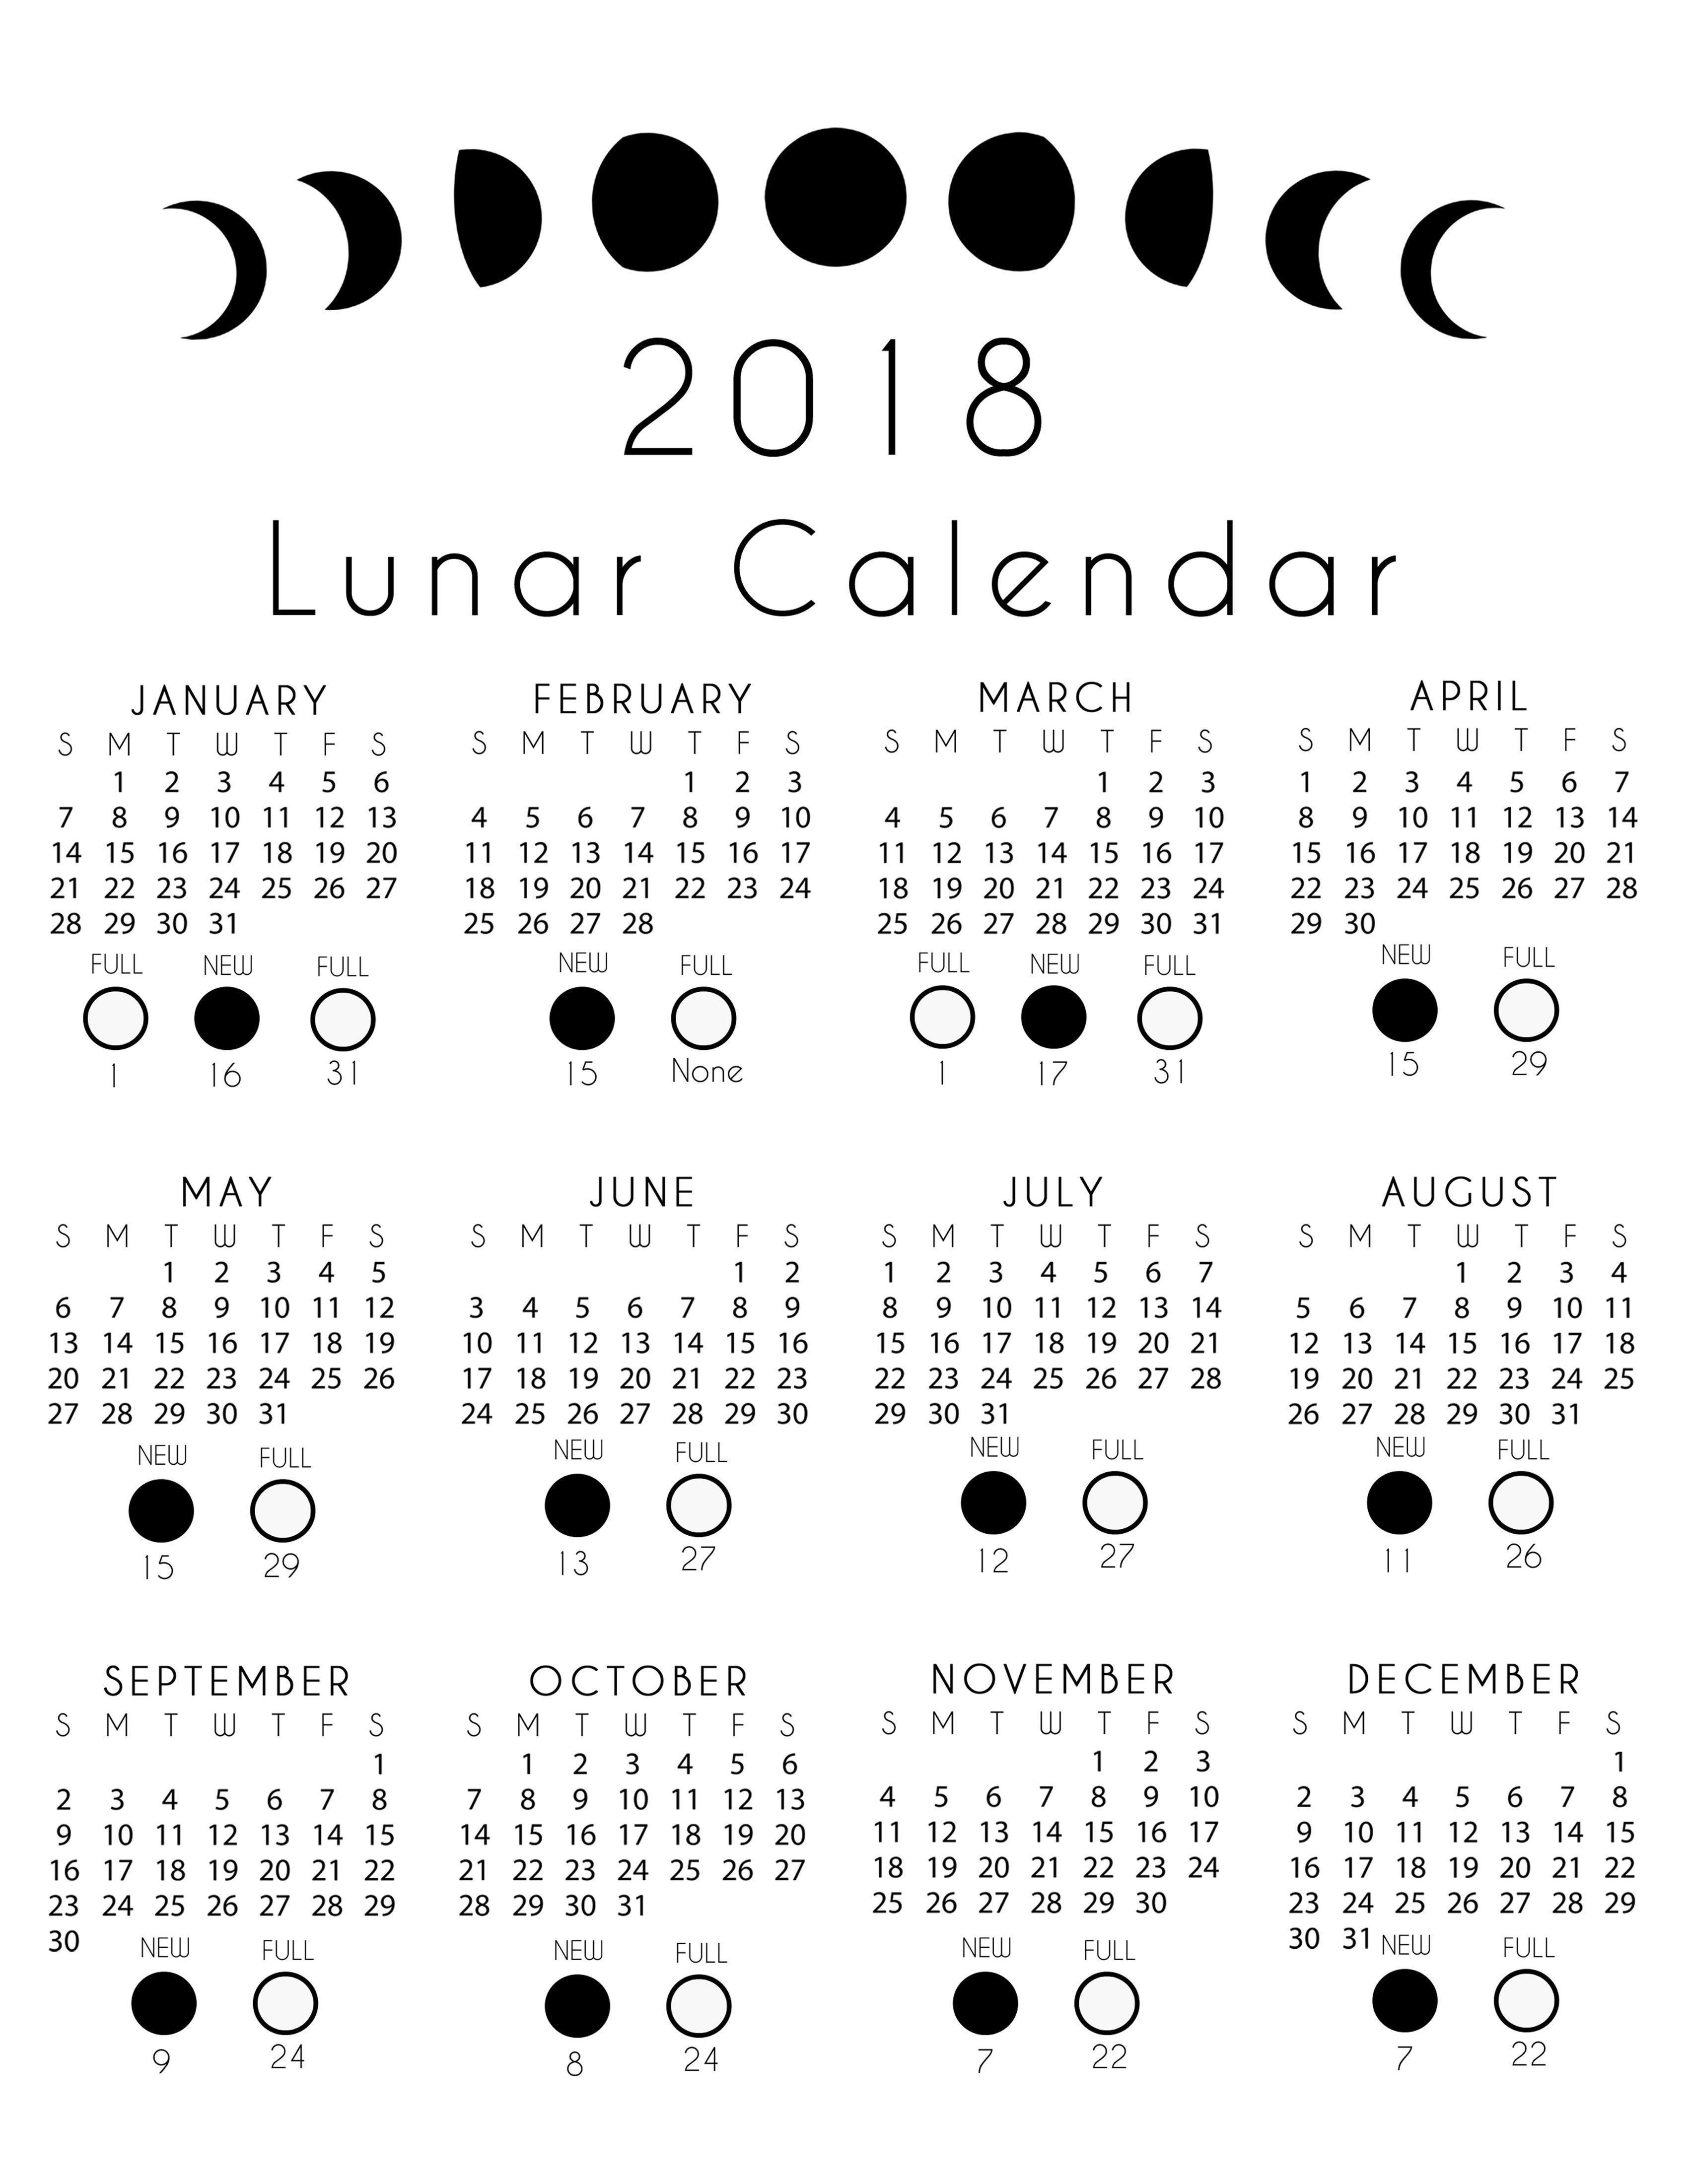 Lunar Calendar Free Printout With Images